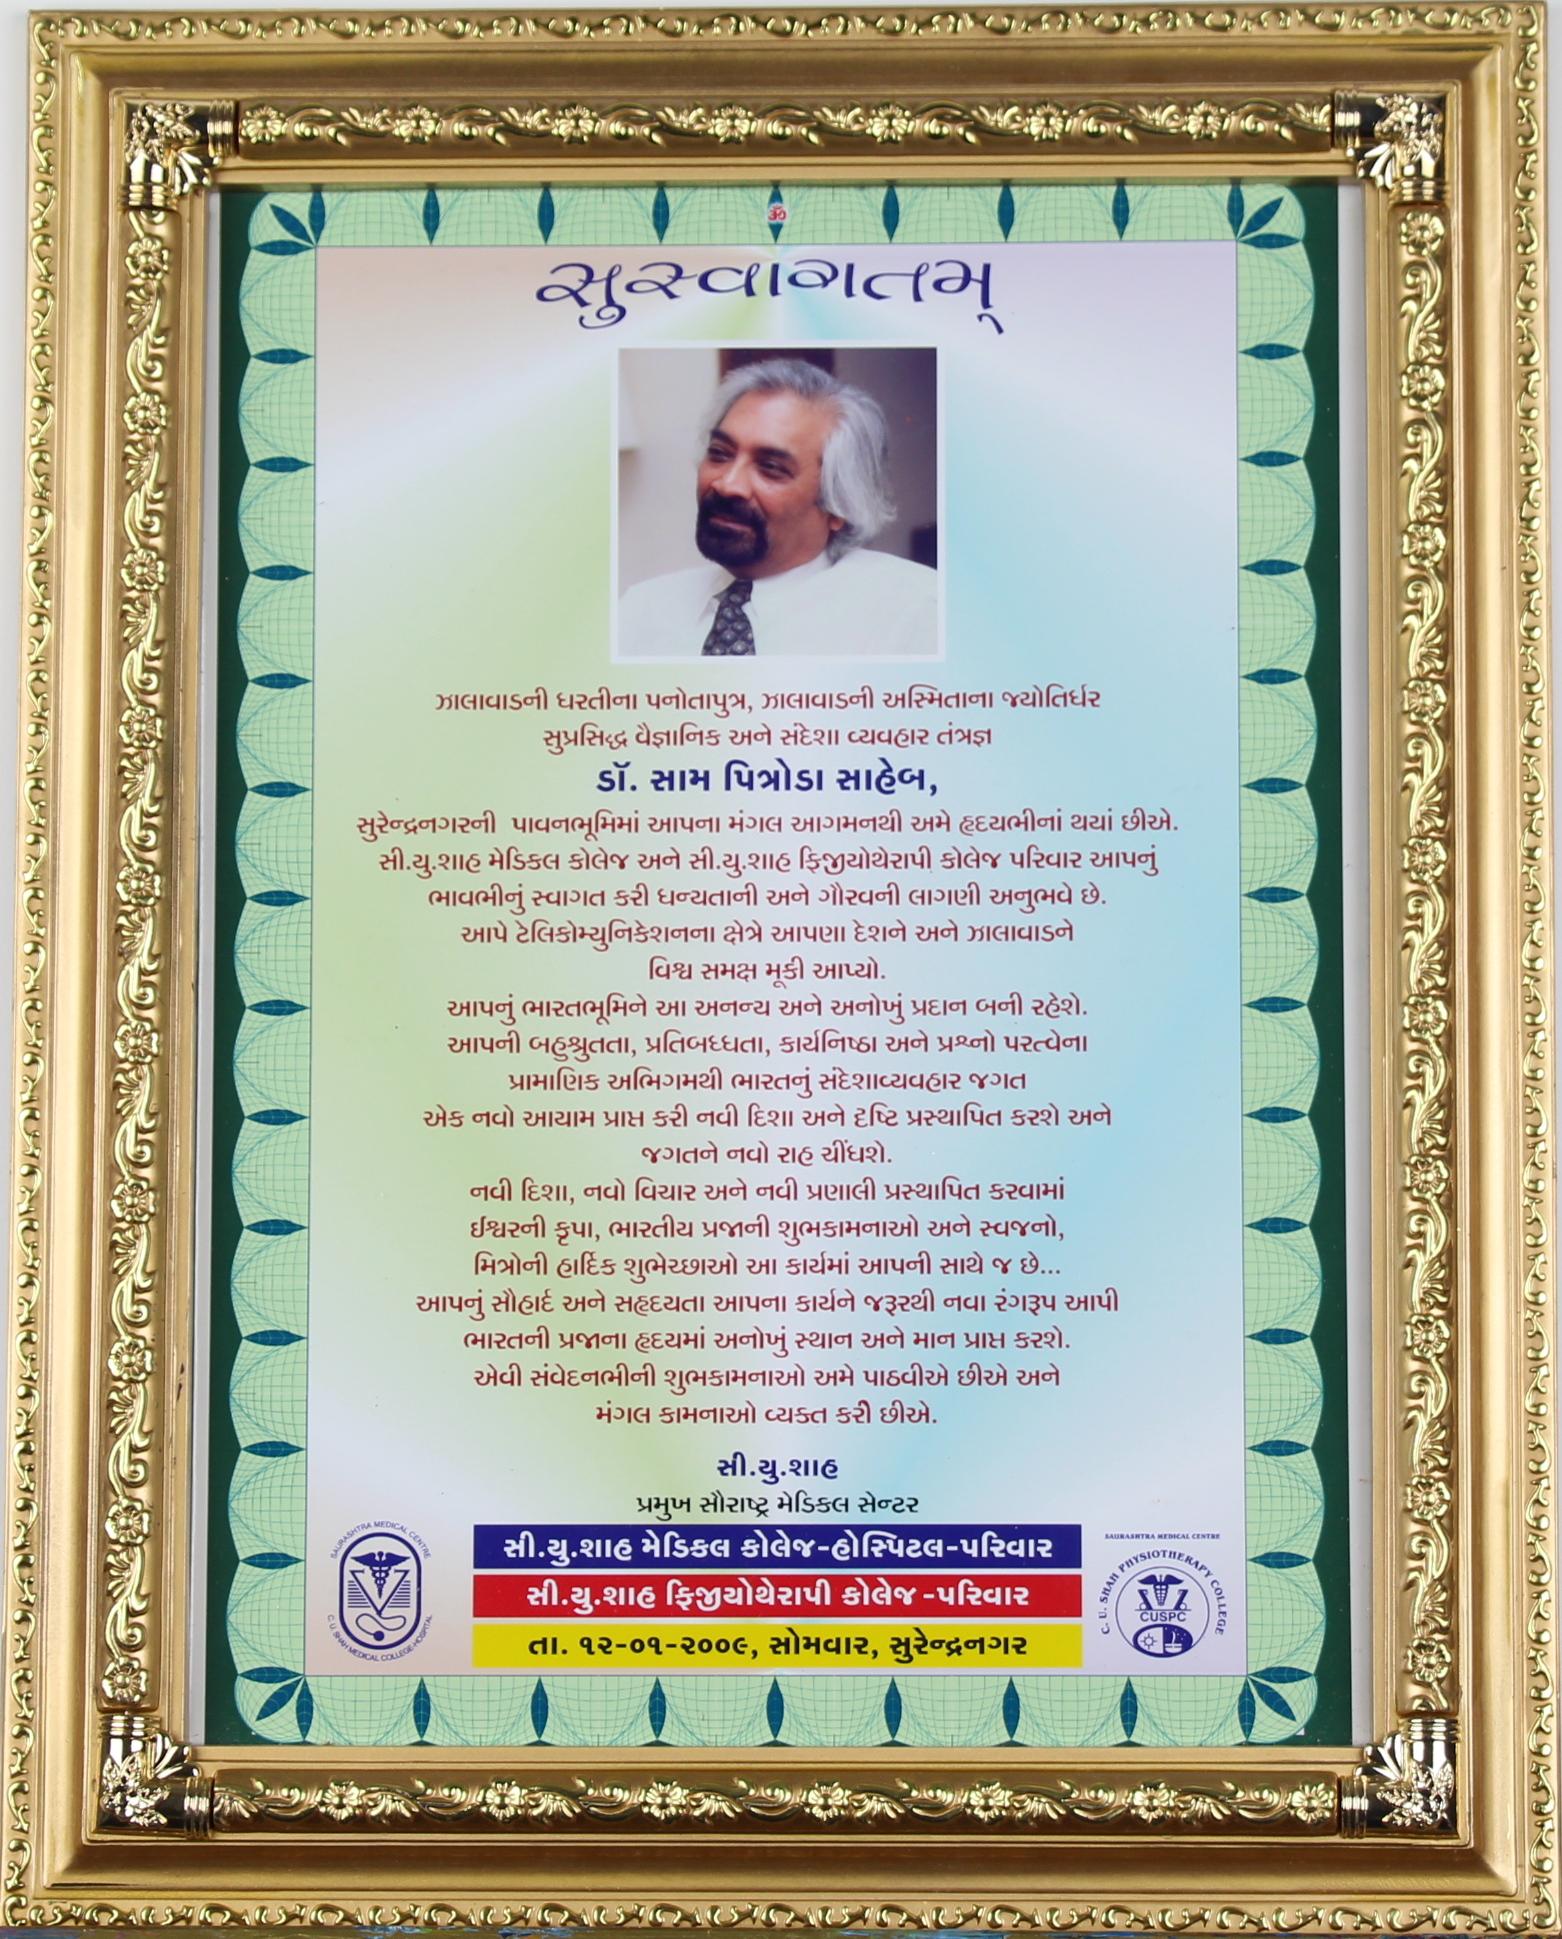 Award of Appreciation, C. U. Shah Medical College and Hospital, Surendra Nagar, 2009